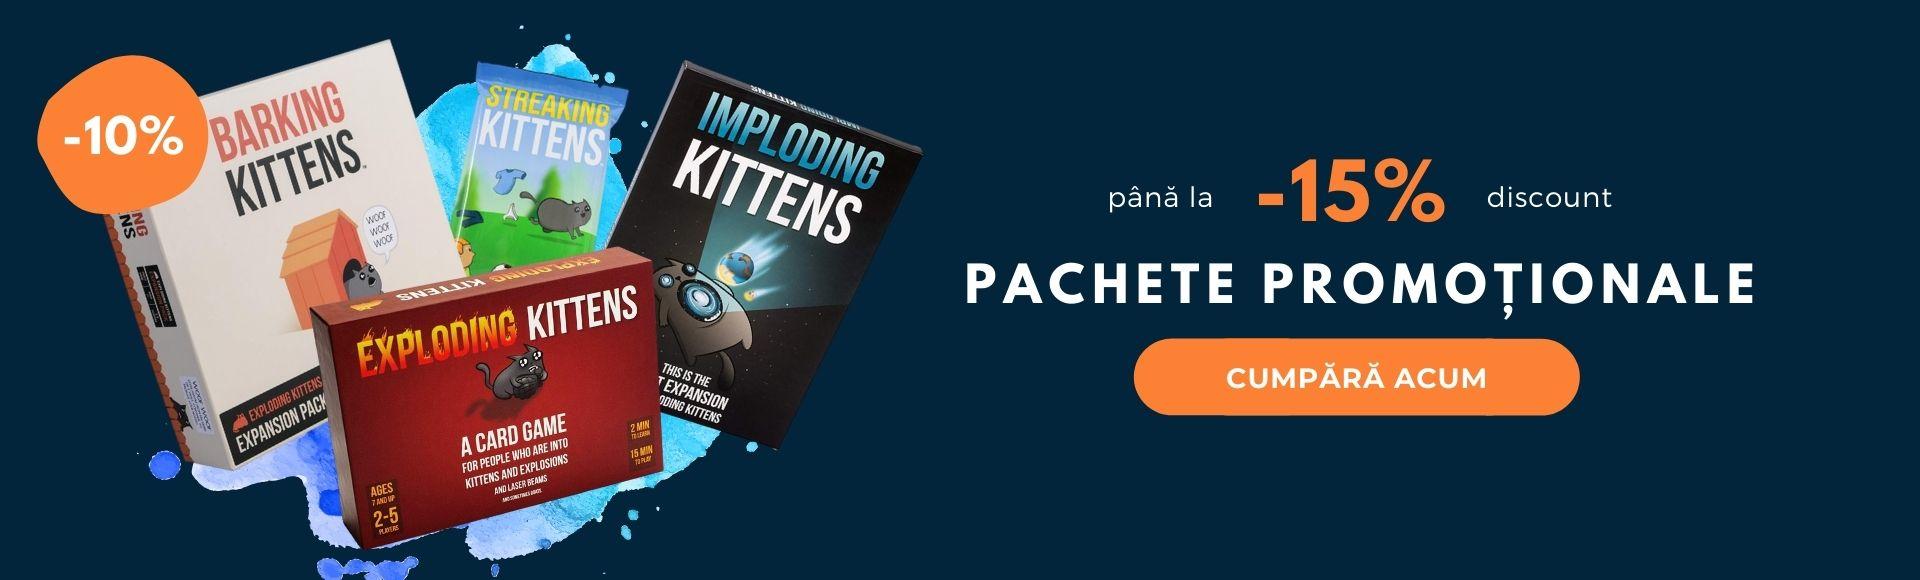 Promo Packs pachete promotionale